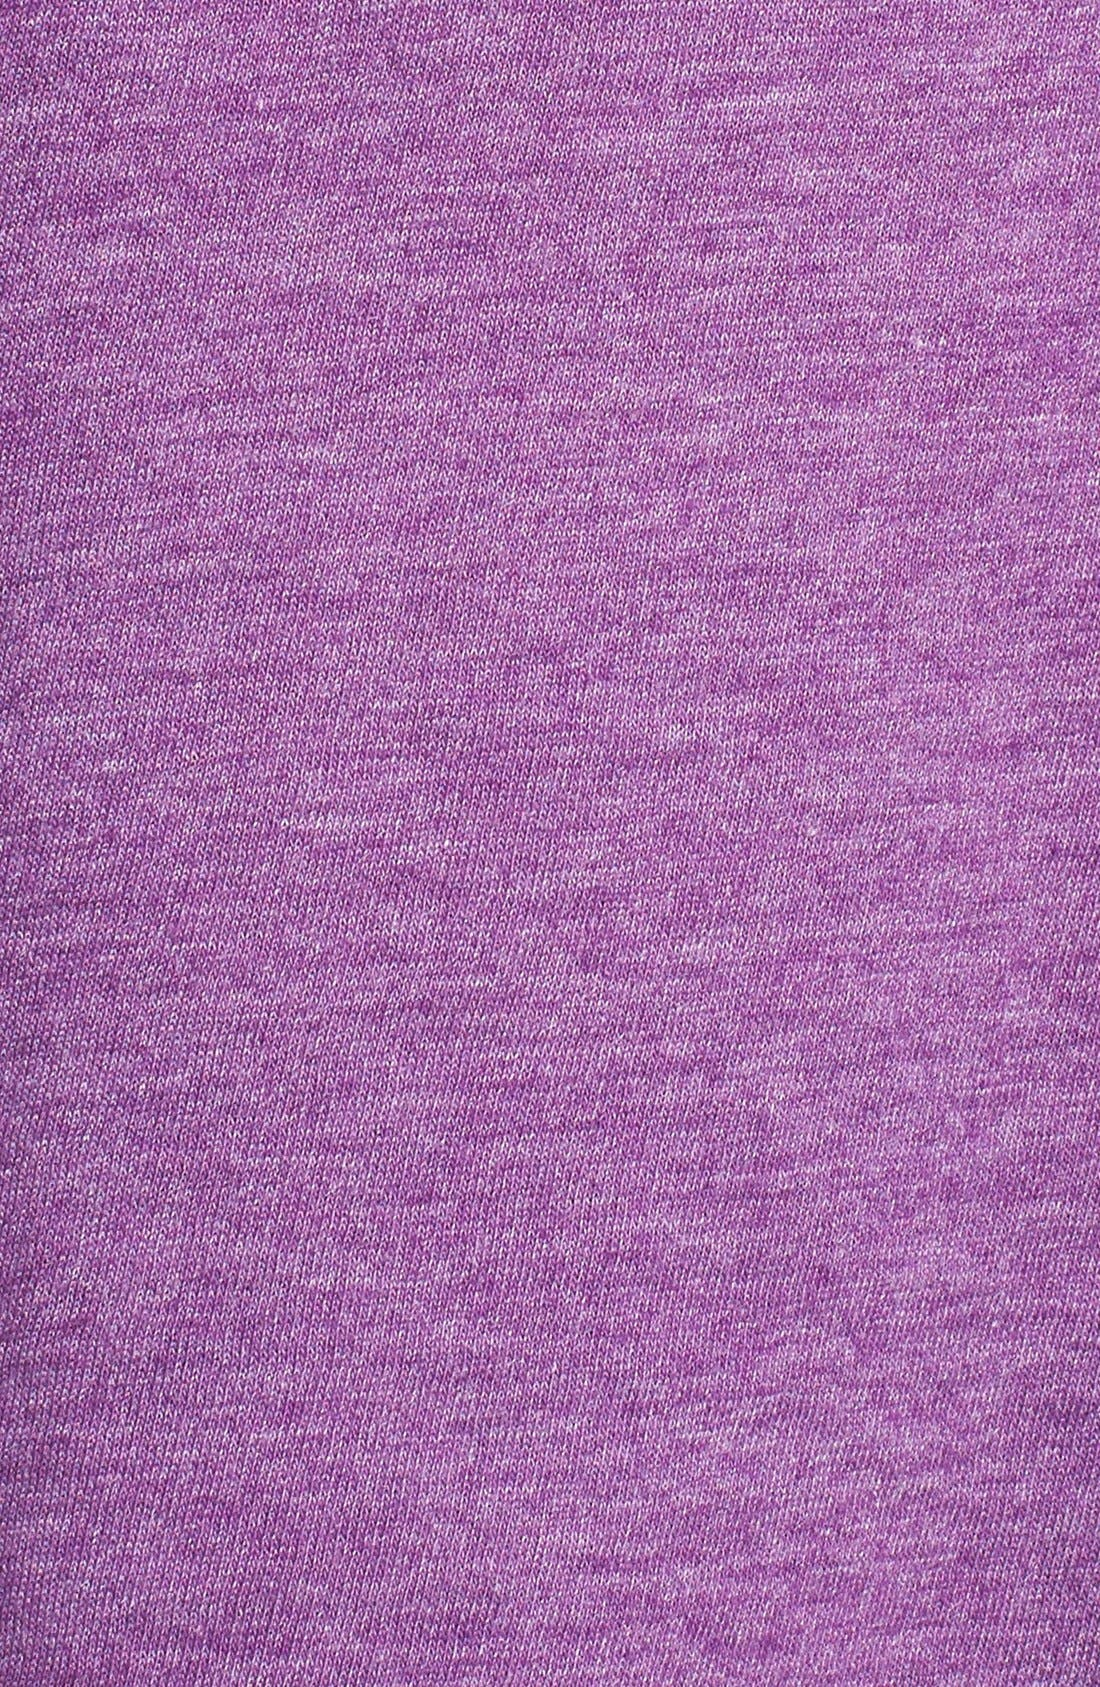 Alternate Image 3  - Wildfox 'My Closet' Camisole